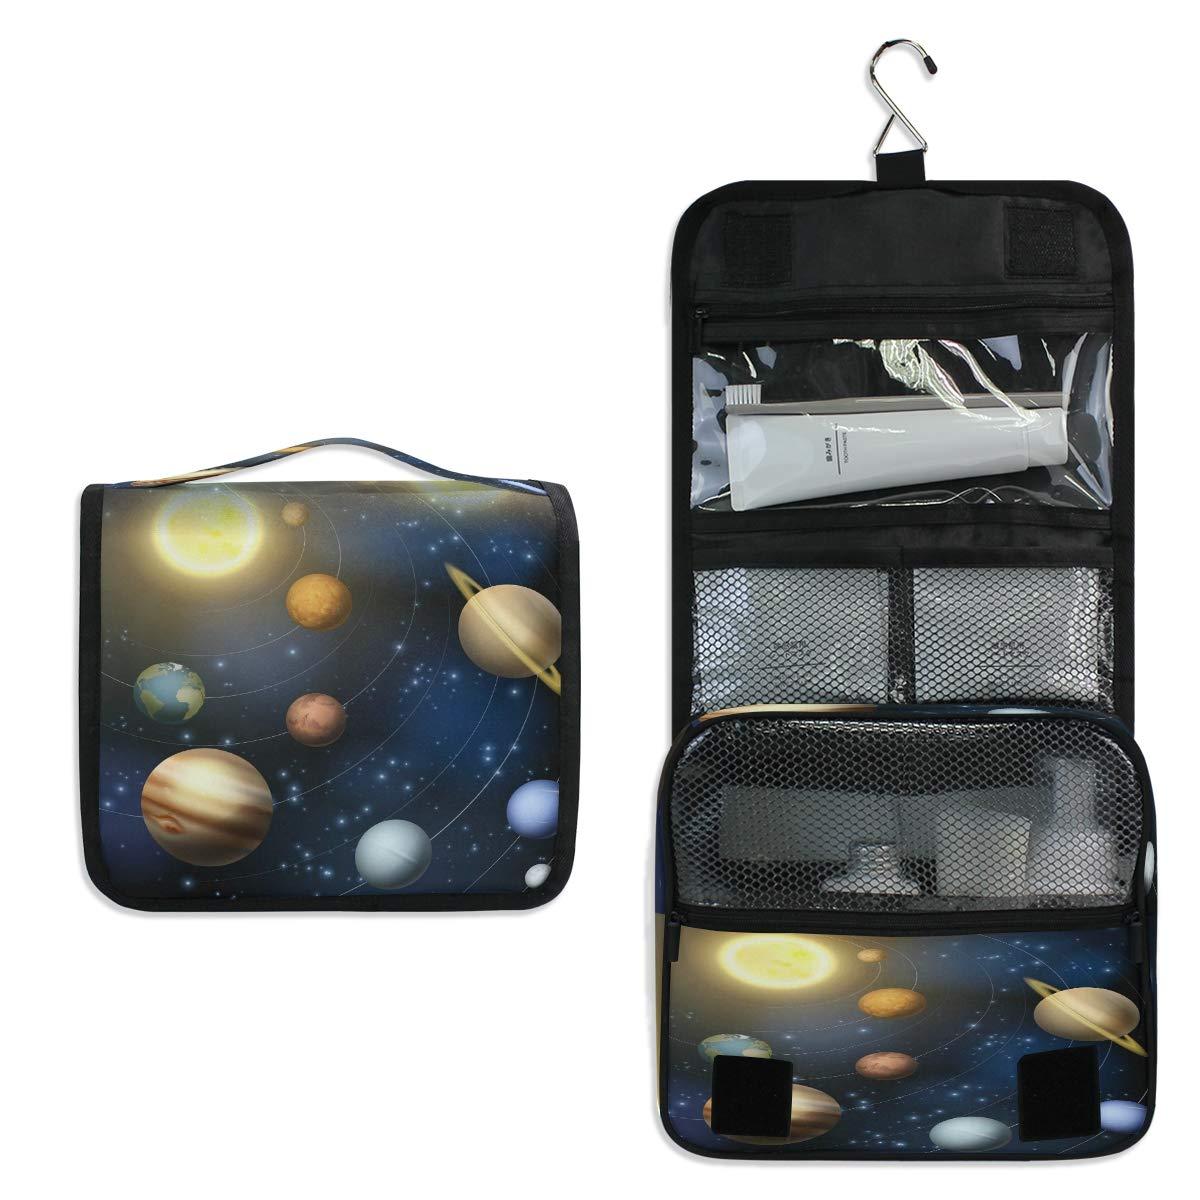 YVONAU Hanging Toiletry Bag Galaxy Solar System Planet Portable Travel Cosmetic Makeup Bag Bathroom Shower Shaving Kit Organizer Bag for Men Women